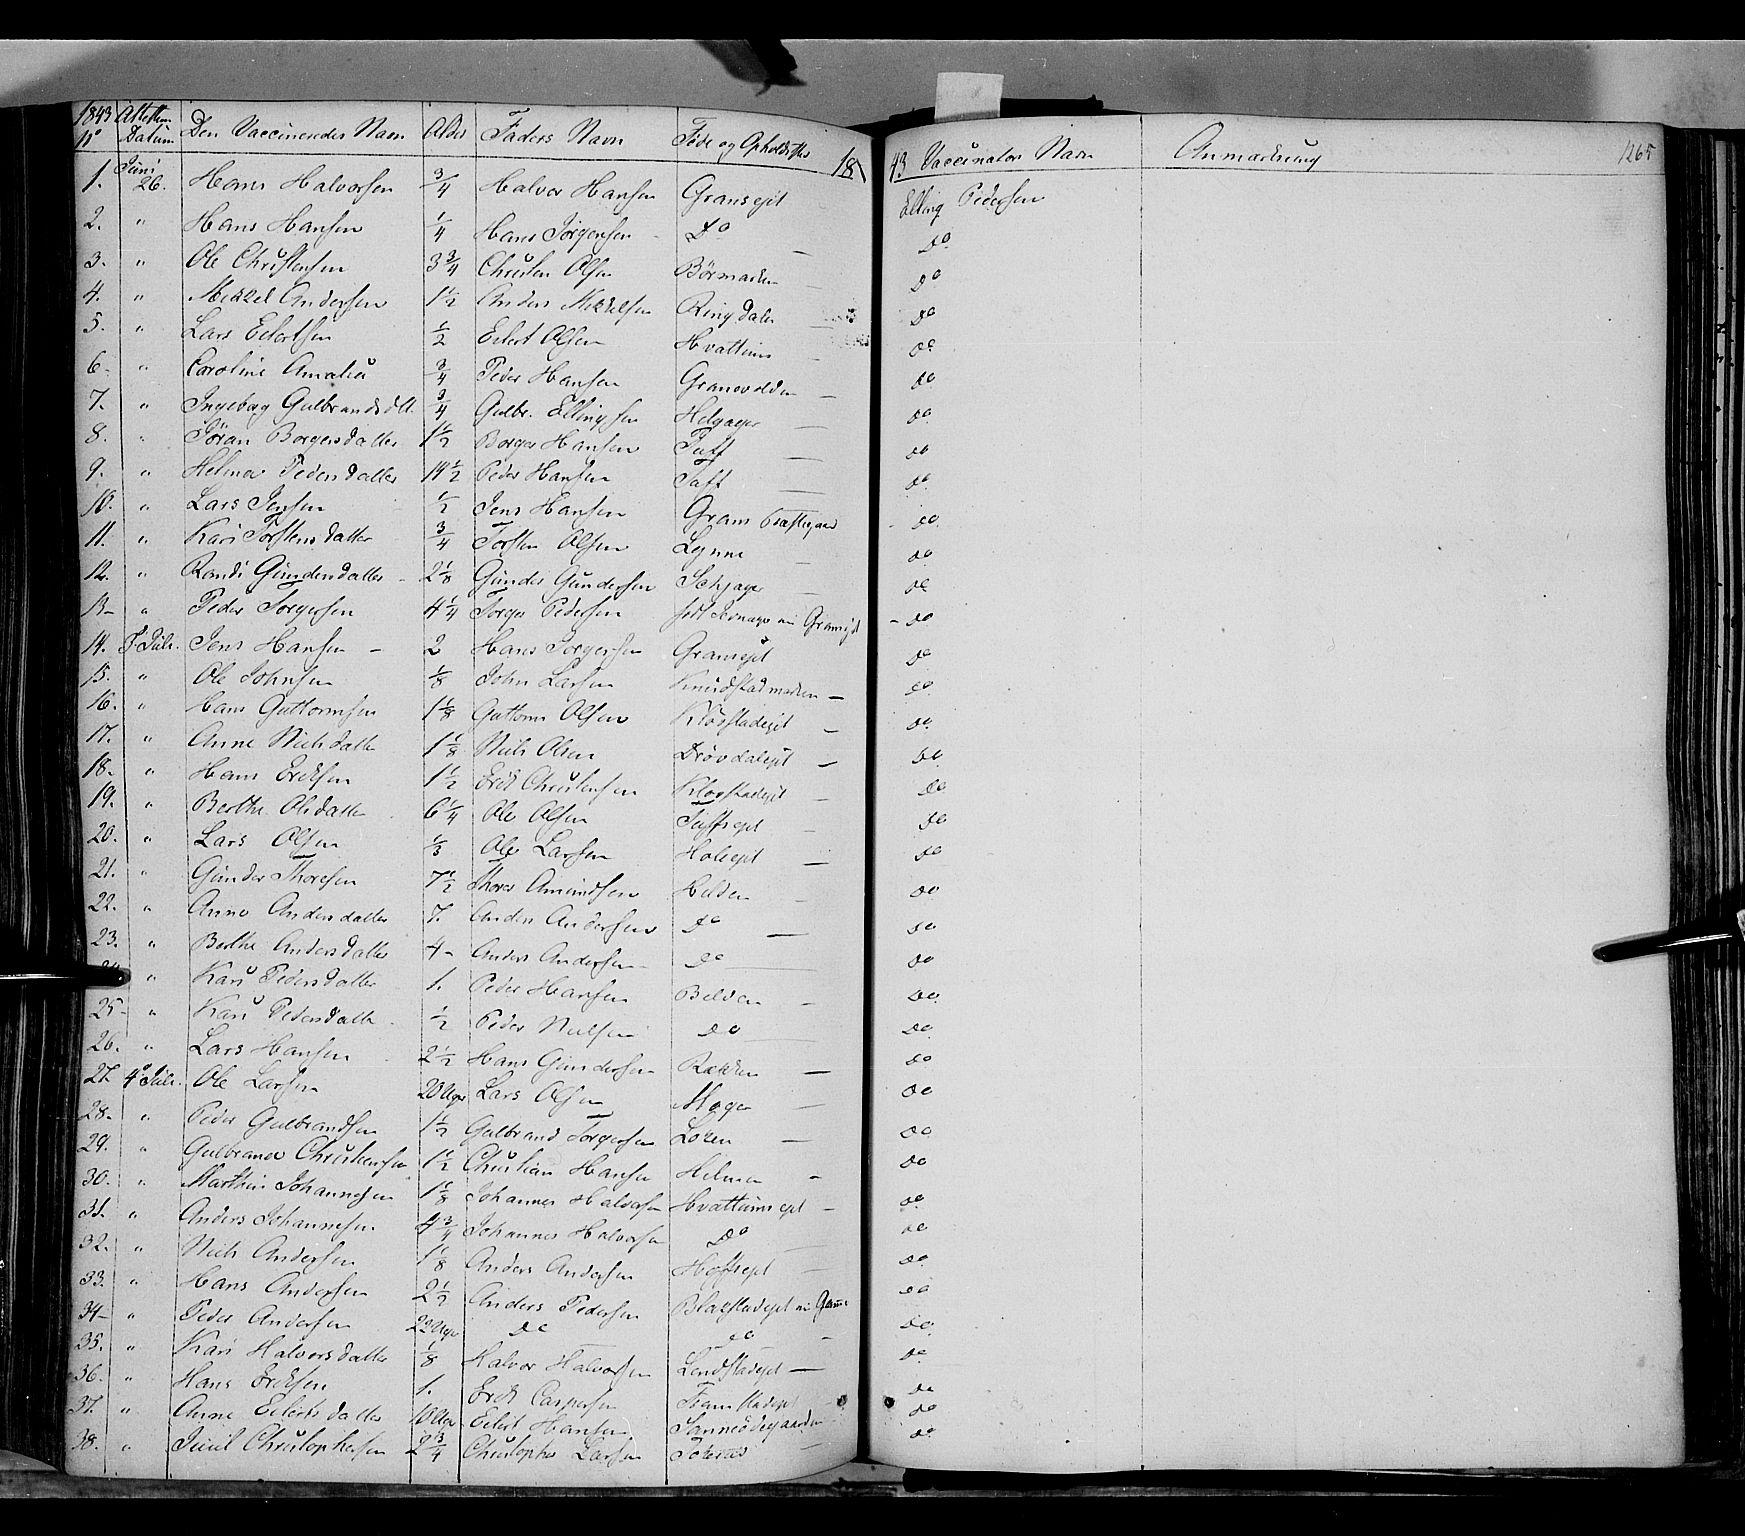 SAH, Gran prestekontor, Ministerialbok nr. 11, 1842-1856, s. 1264-1265